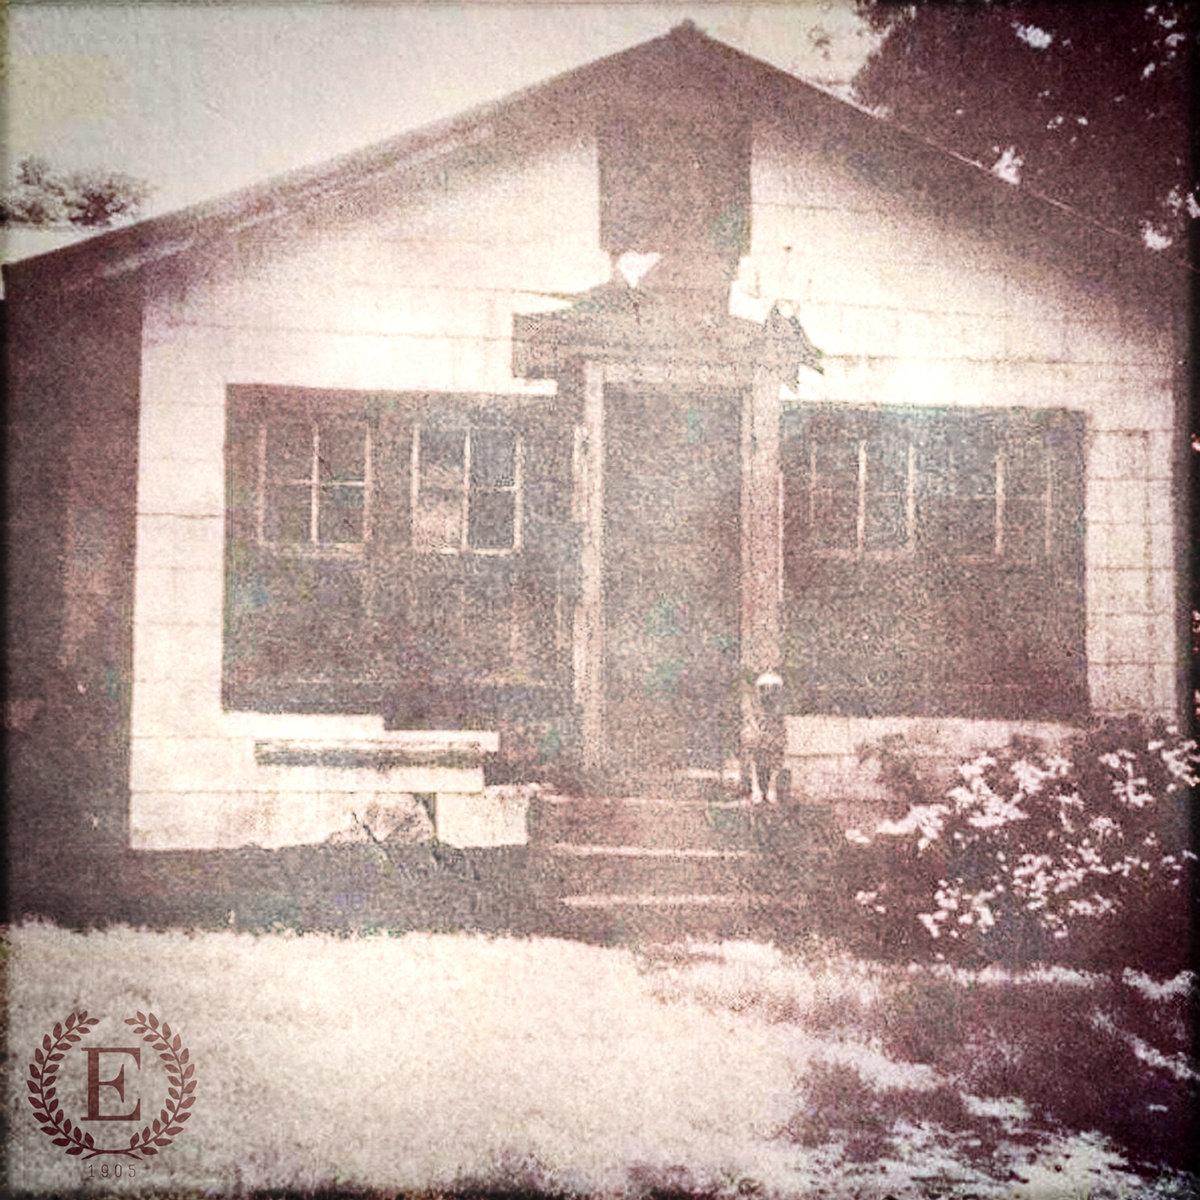 Eddington | 1905 | BearHead Music